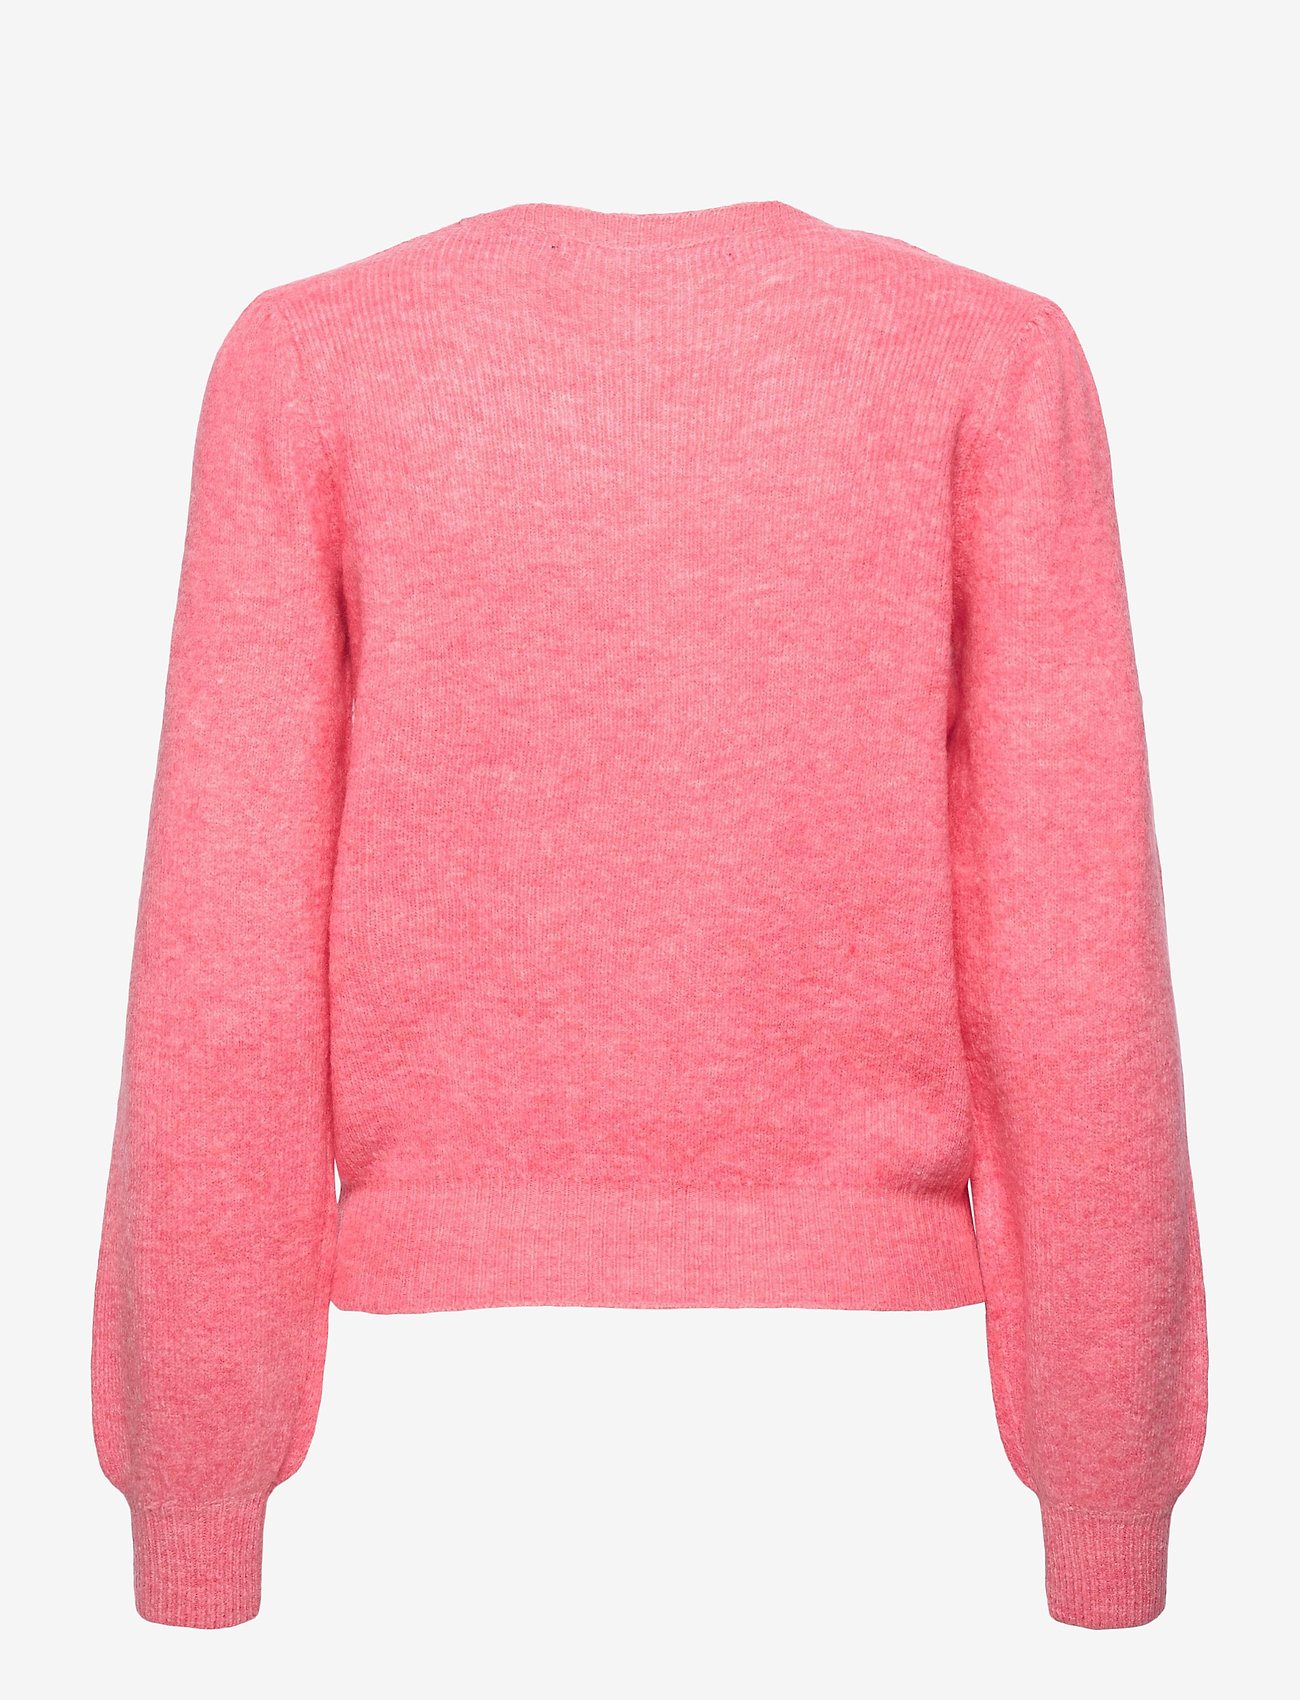 Vero Moda - VMLEFILE PUFF LS BLOUSE REP - tröjor - geranium pink - 1